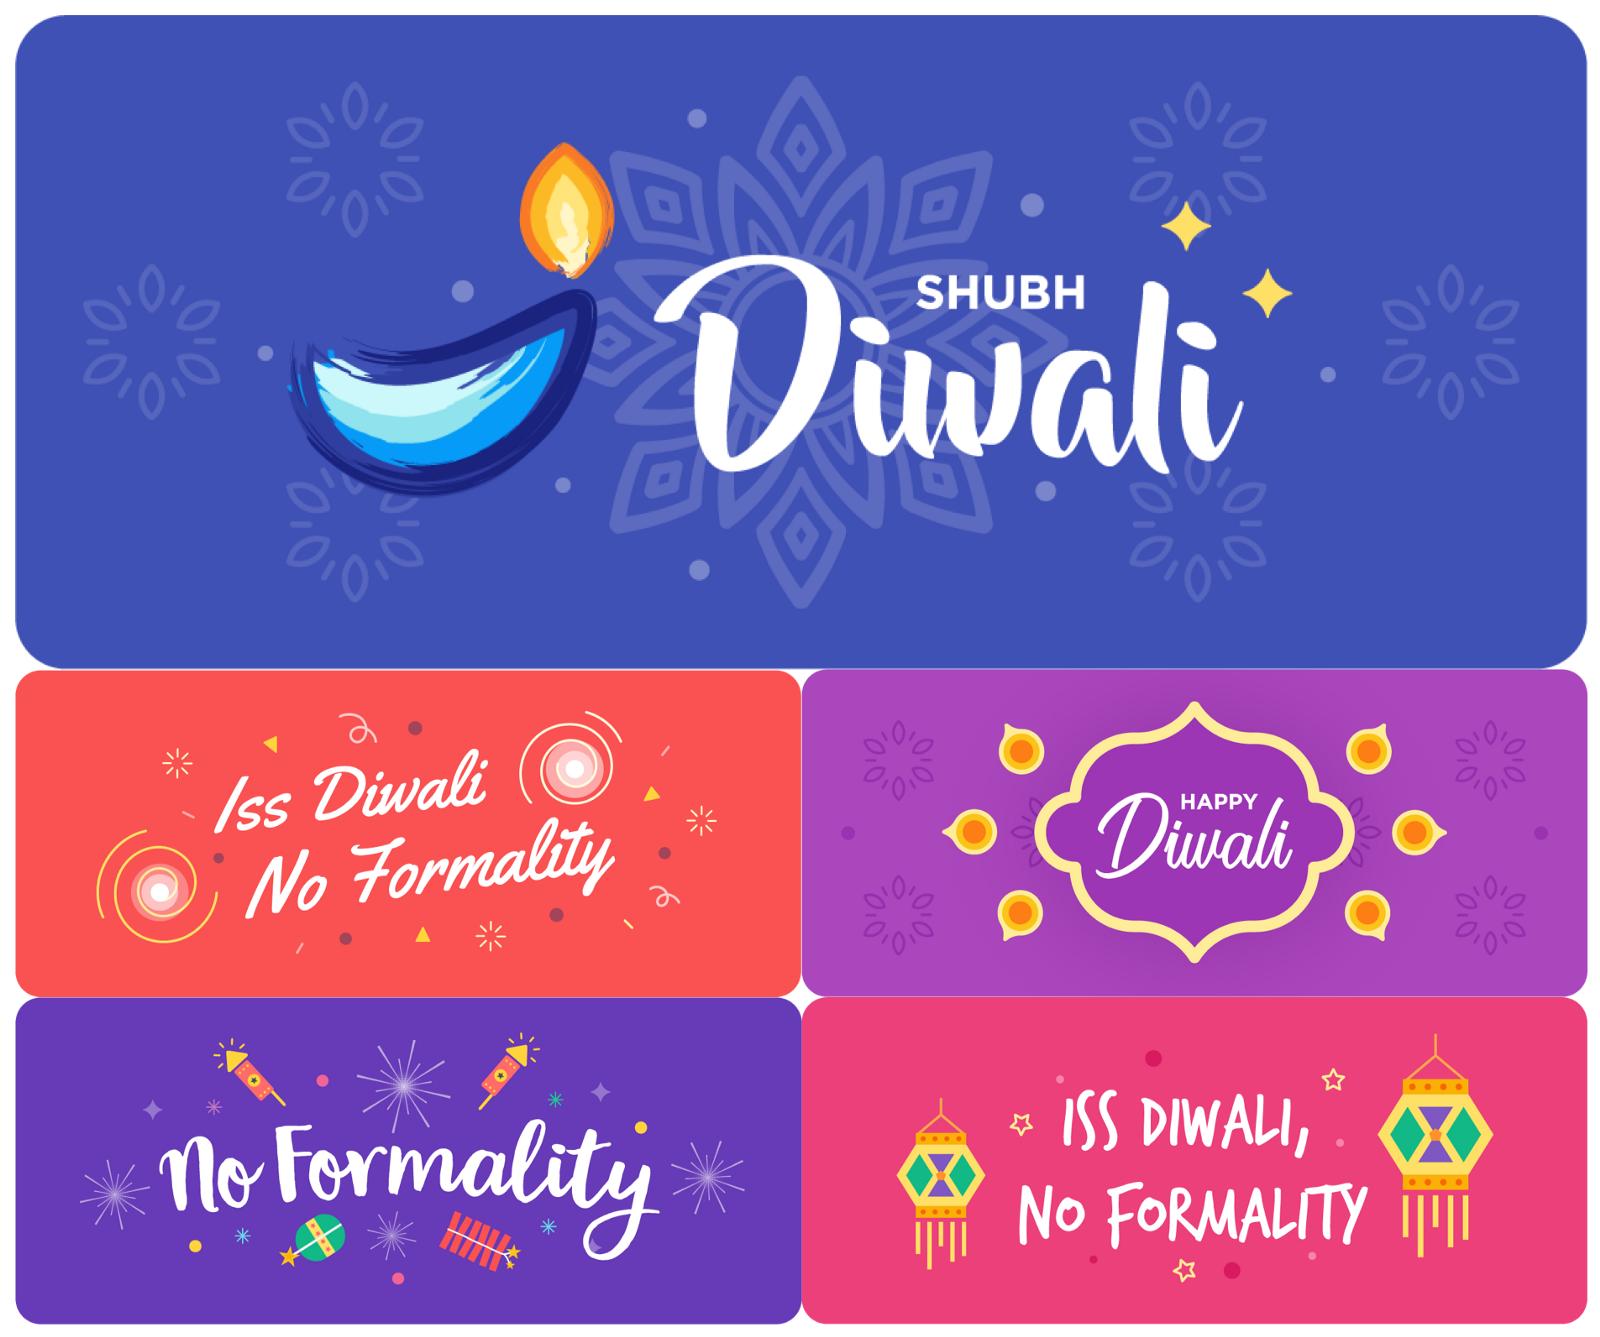 Subh Diwali Stickers for Whatsapp